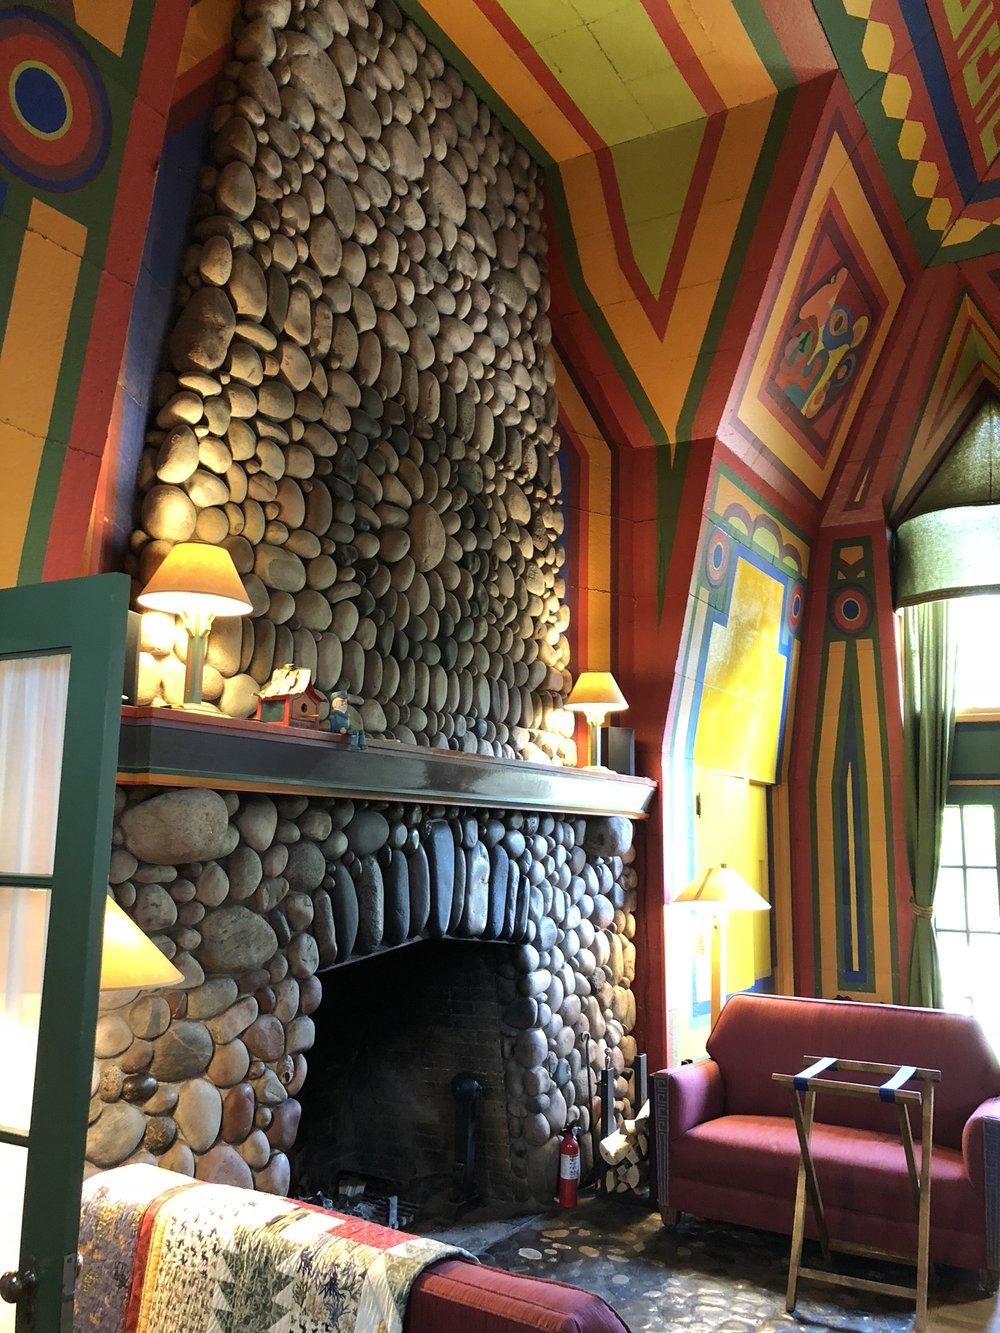 Naniboujou Lodge Dining Room fireplace